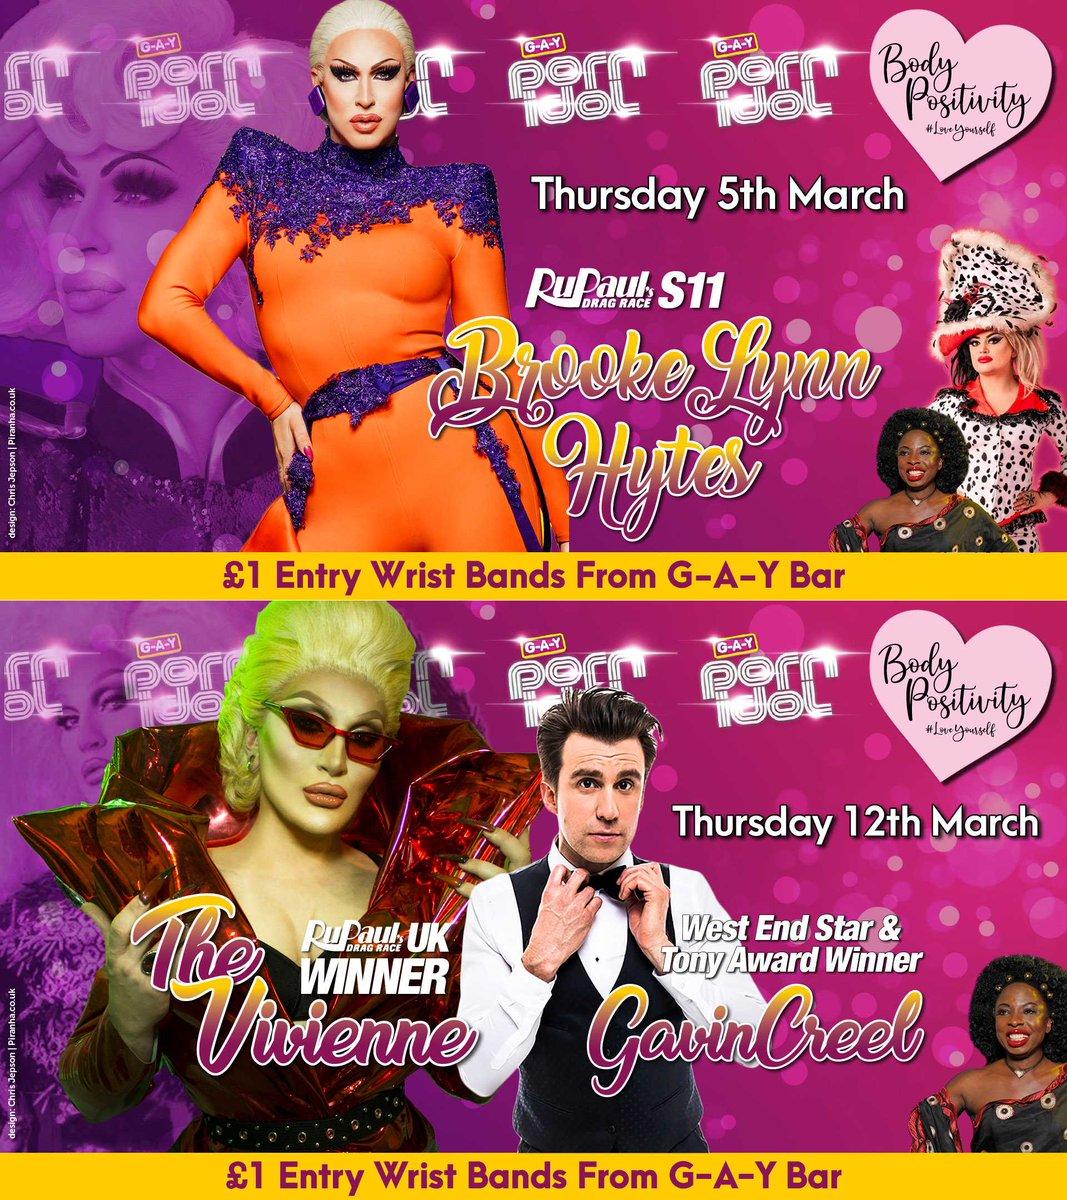 G-A-Y Porn Idol Judges   Next Thursday  @RuPaulsDragRace S11 Runner Up @Bhytes1  @dragraceukbbc 🍟 @ChipShopBird  @SonofaTutu   Thurs 12th March  @dragraceukbbc Winner @THEVIVIENNEUK  Tony Award Winner @gavincreel  @SonofaTutu   #DragRace #BodyPositivity #LoveYourself #Heaven40